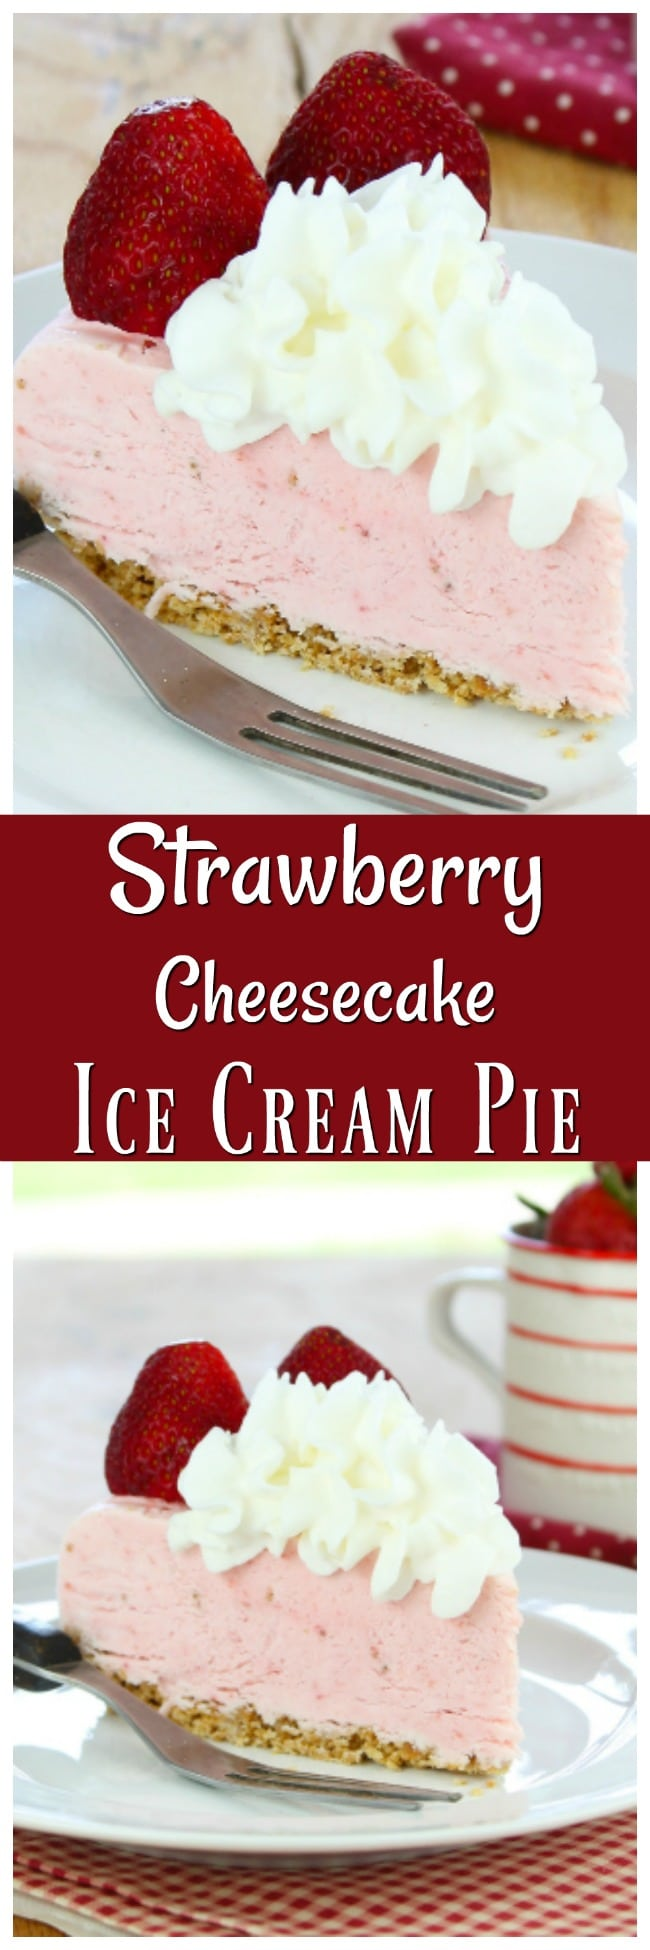 Strawberry-Cheesecake-Ice-Cream-Pie-Plated-Photo-Collage